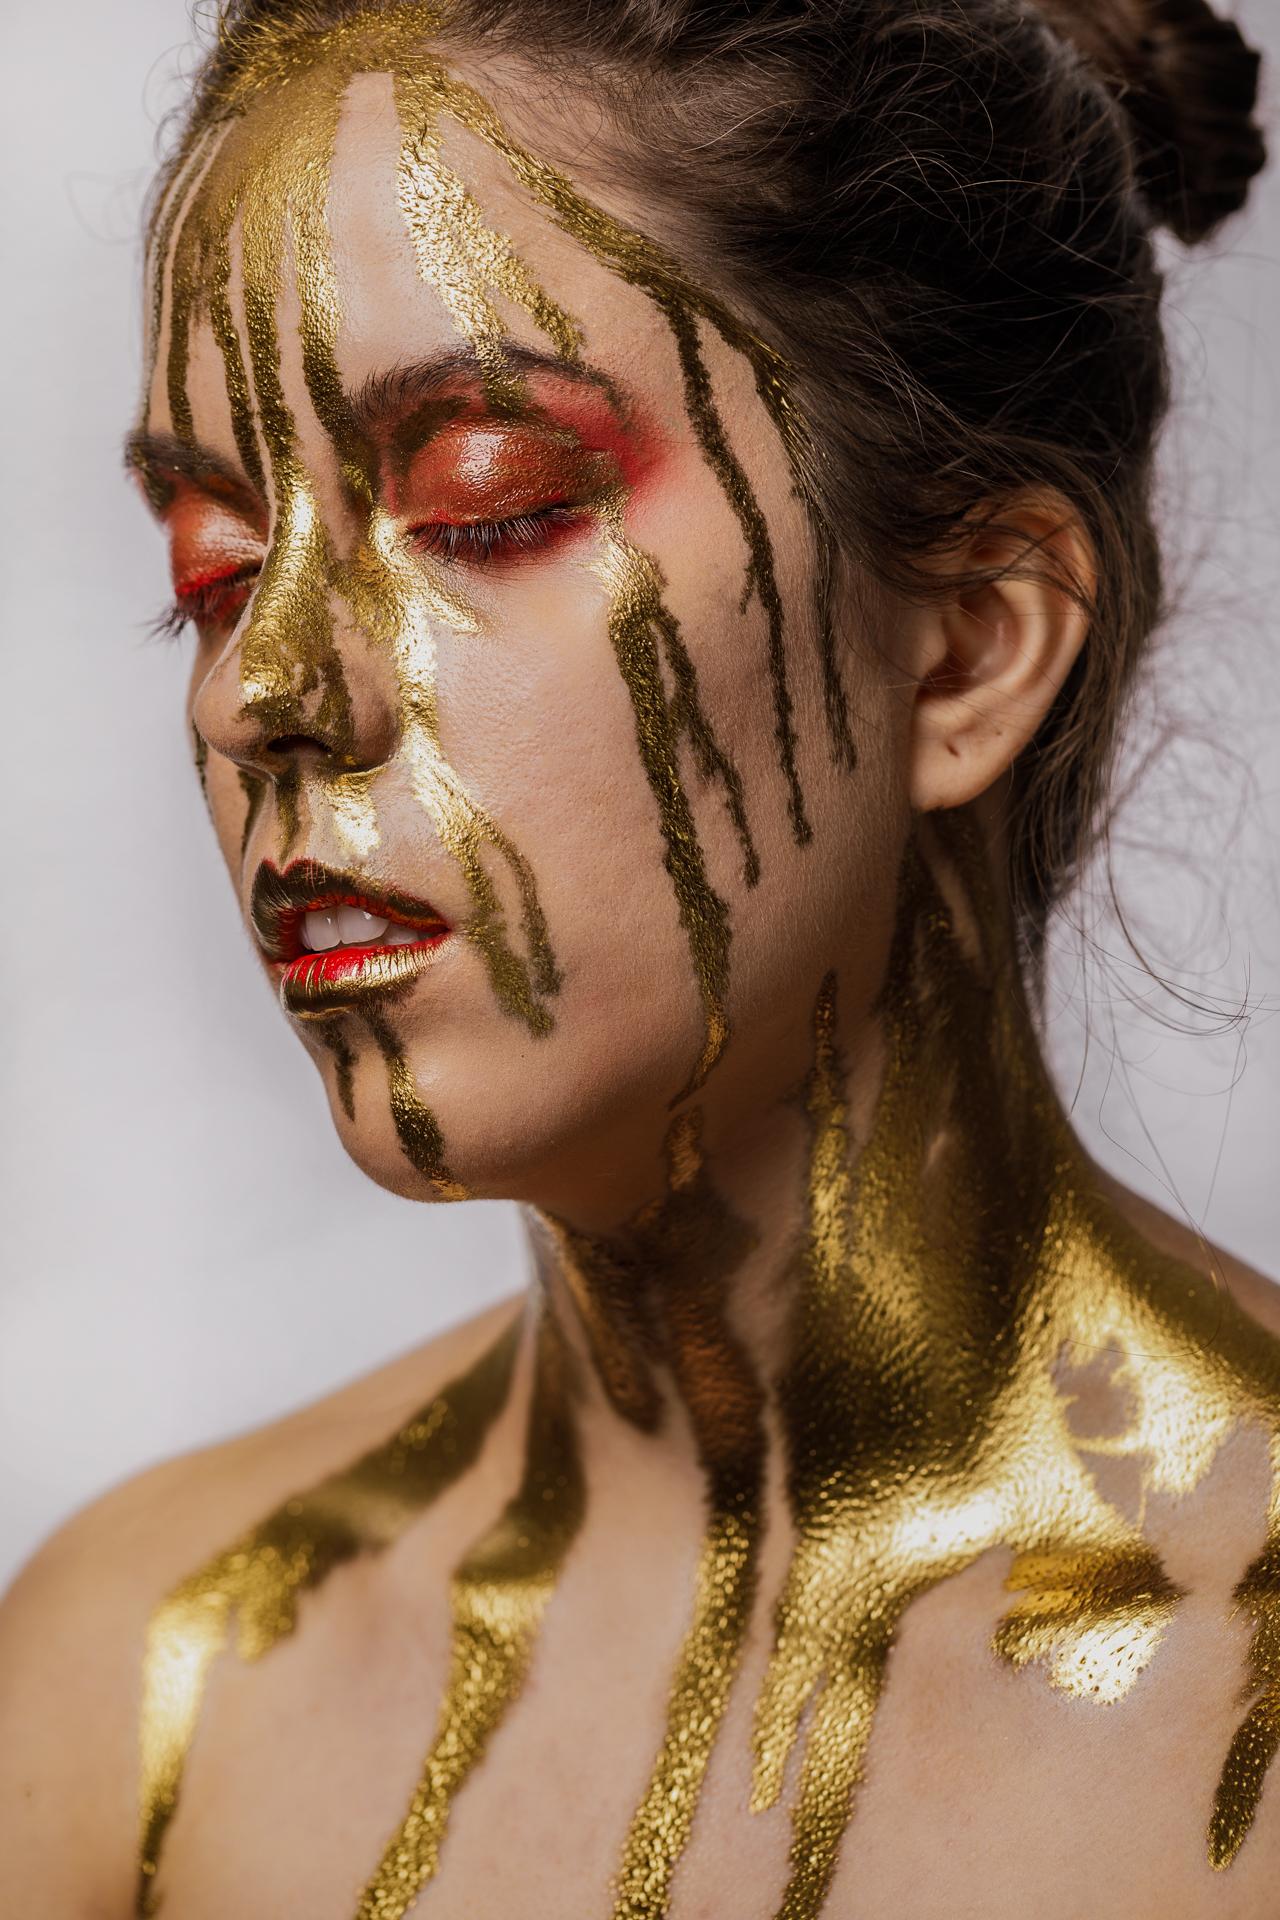 CFrenette-Julie-maquillage-5